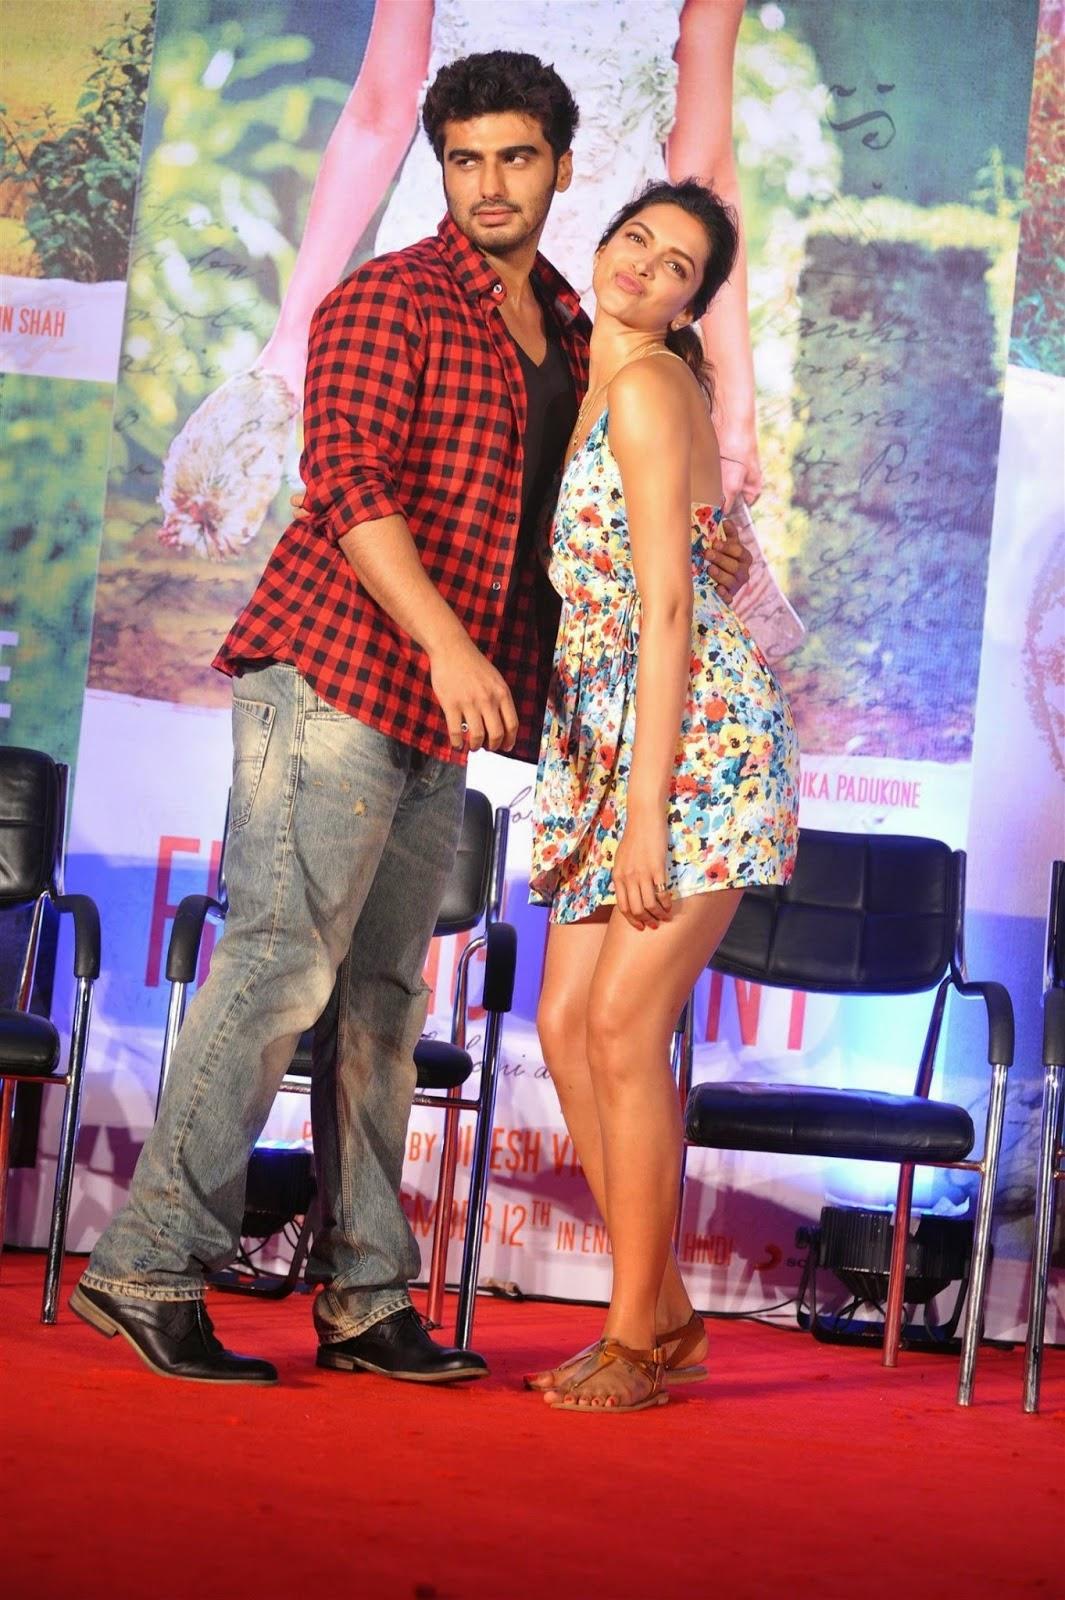 Deepika Padukone & Arjun Kapoor at Finding Fanny Music Launch